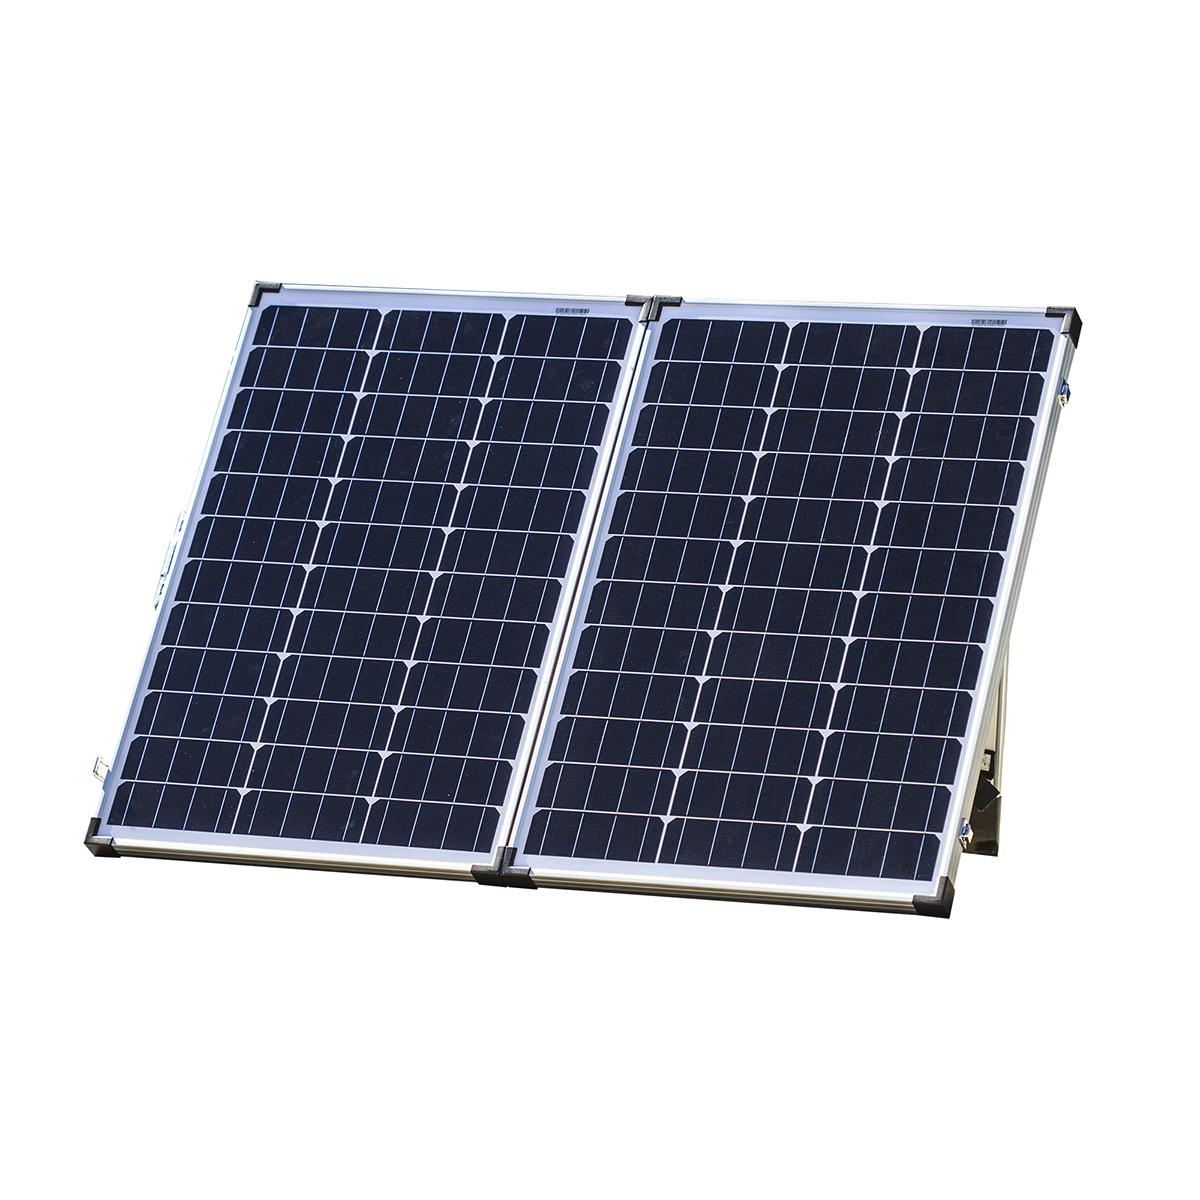 120 Watt 12v Mono Crystalline Folding Solar Panel Kit